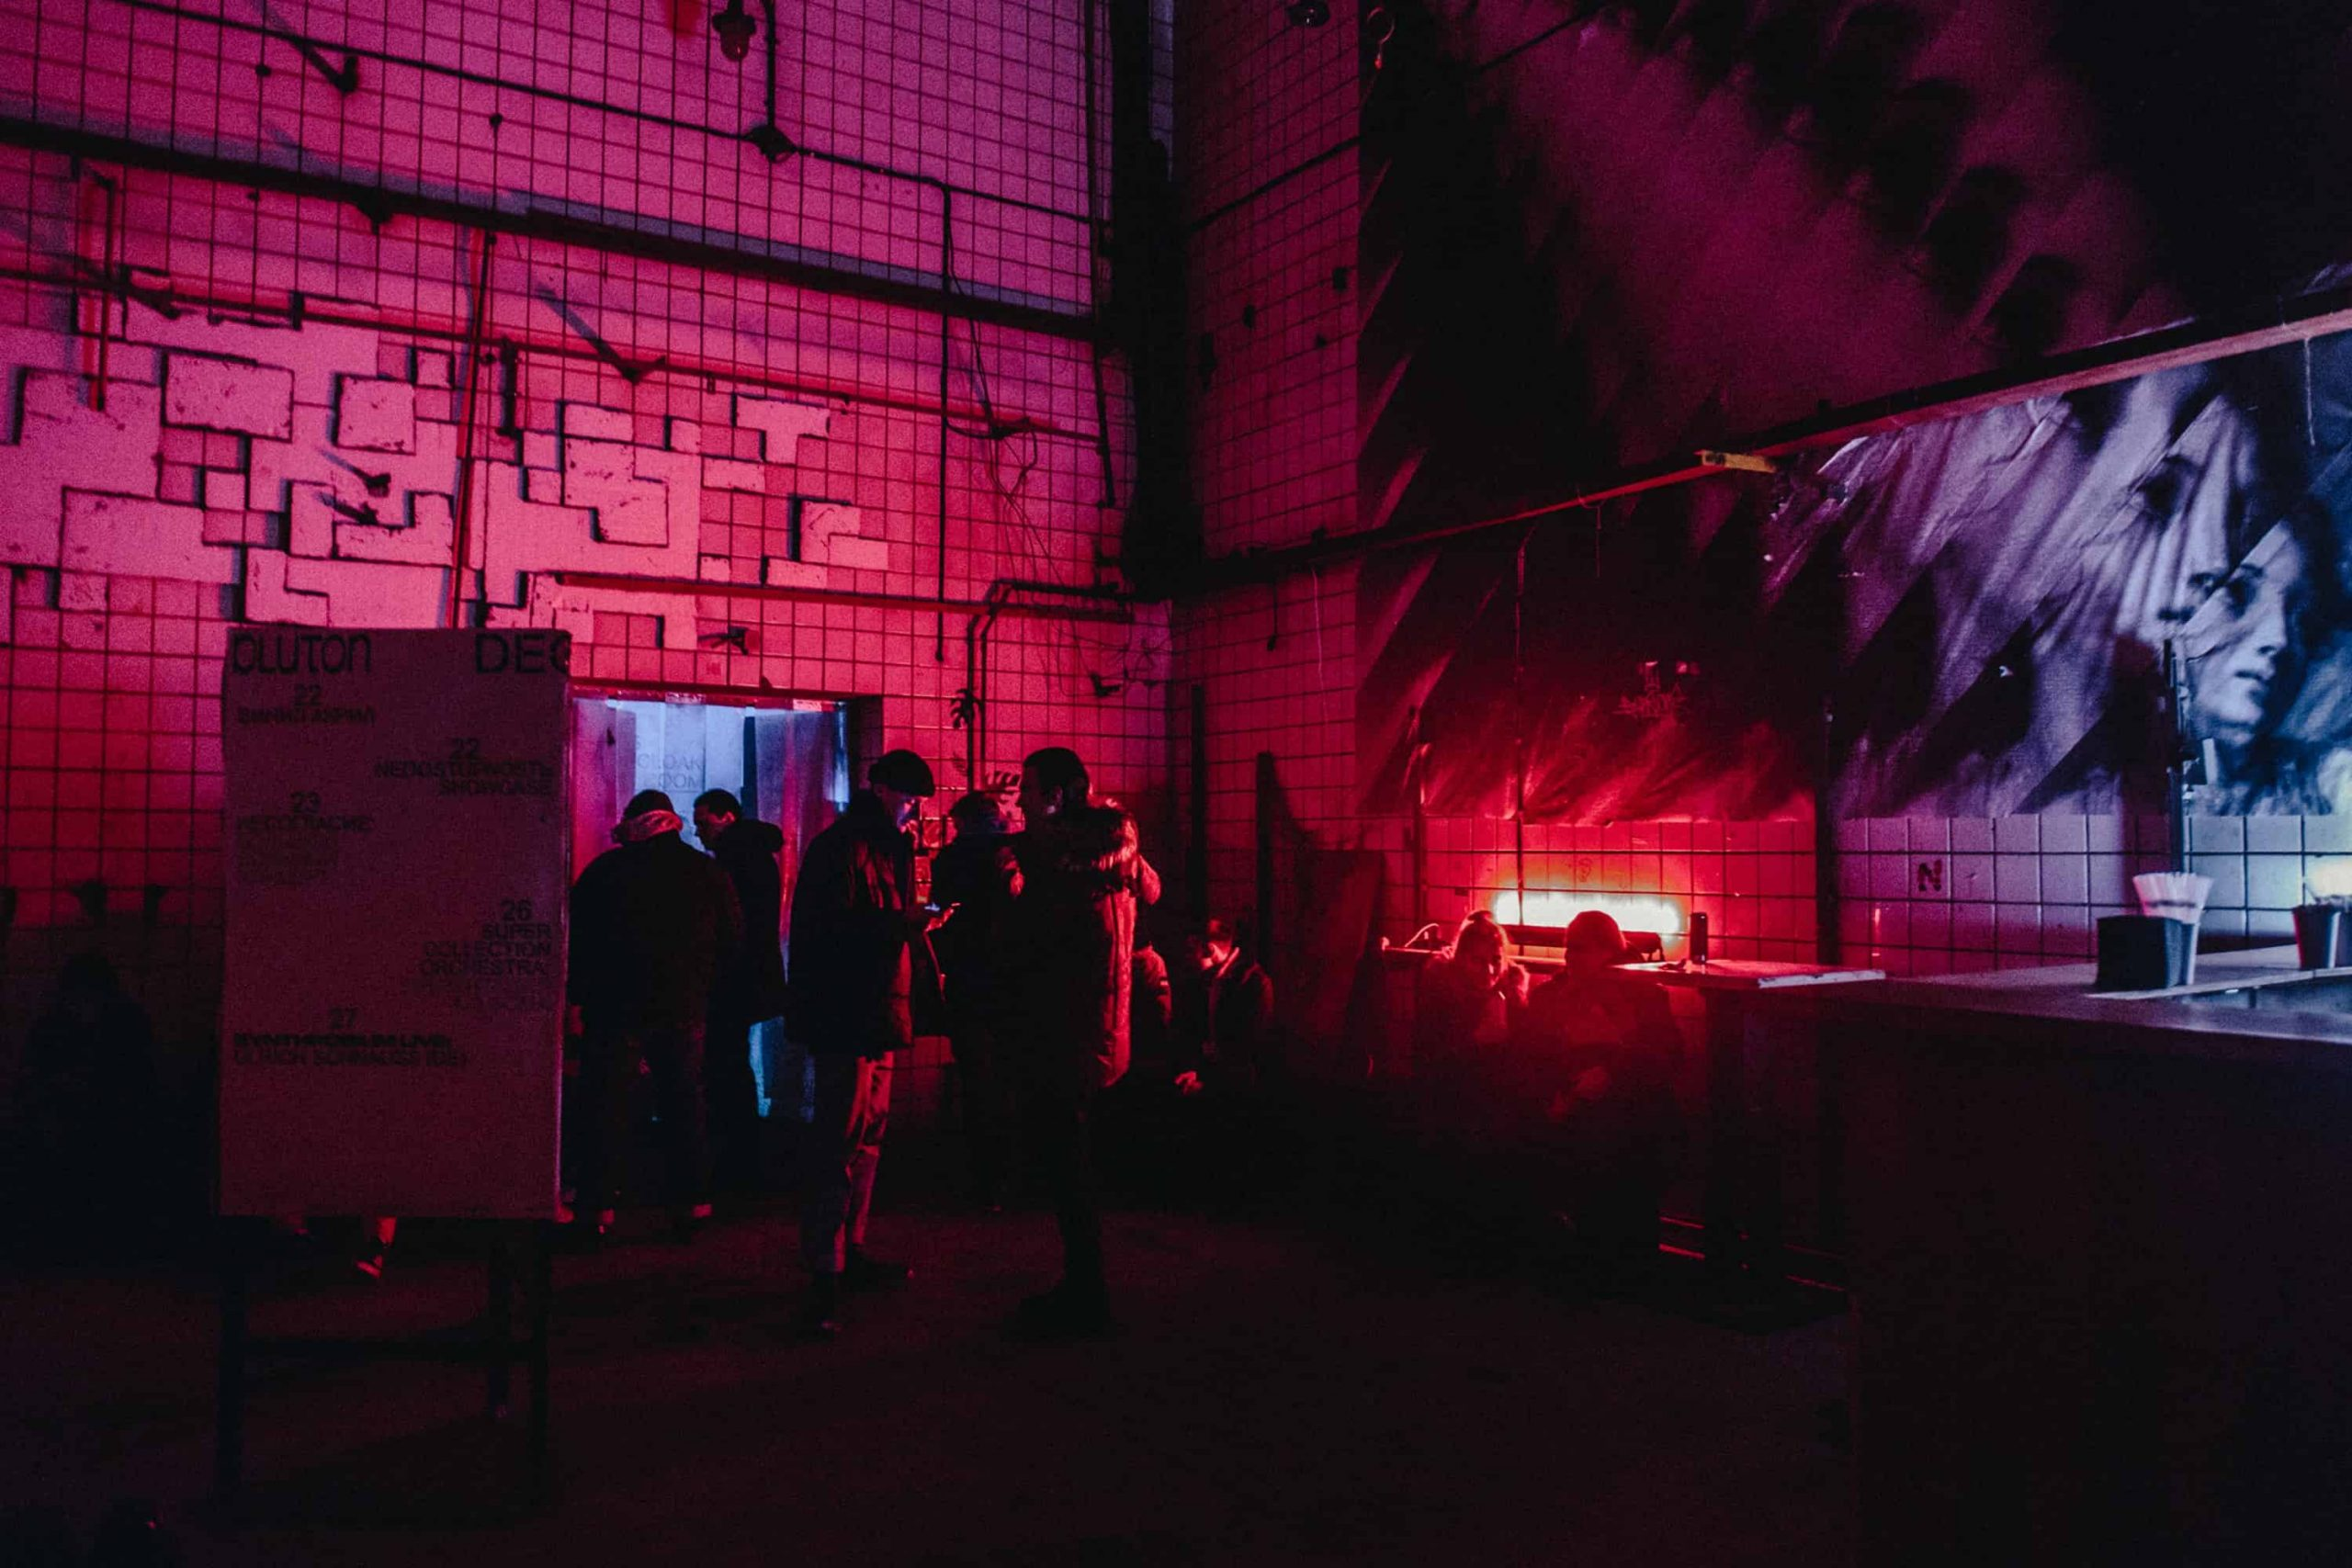 Russian nightclub entrance Alexander Popov